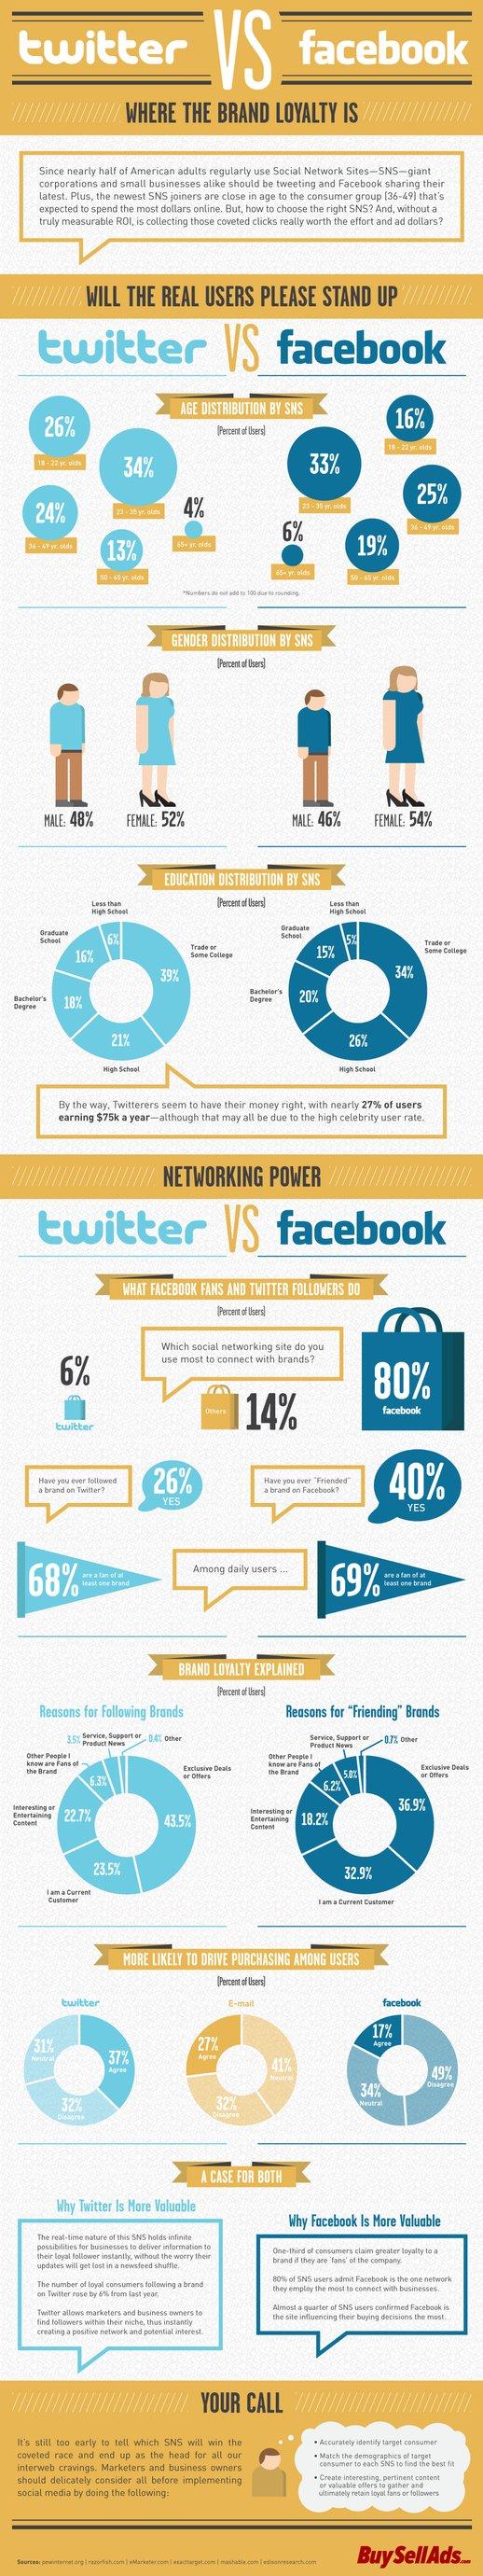 Twitter VS Facebook: Brand Loyalty